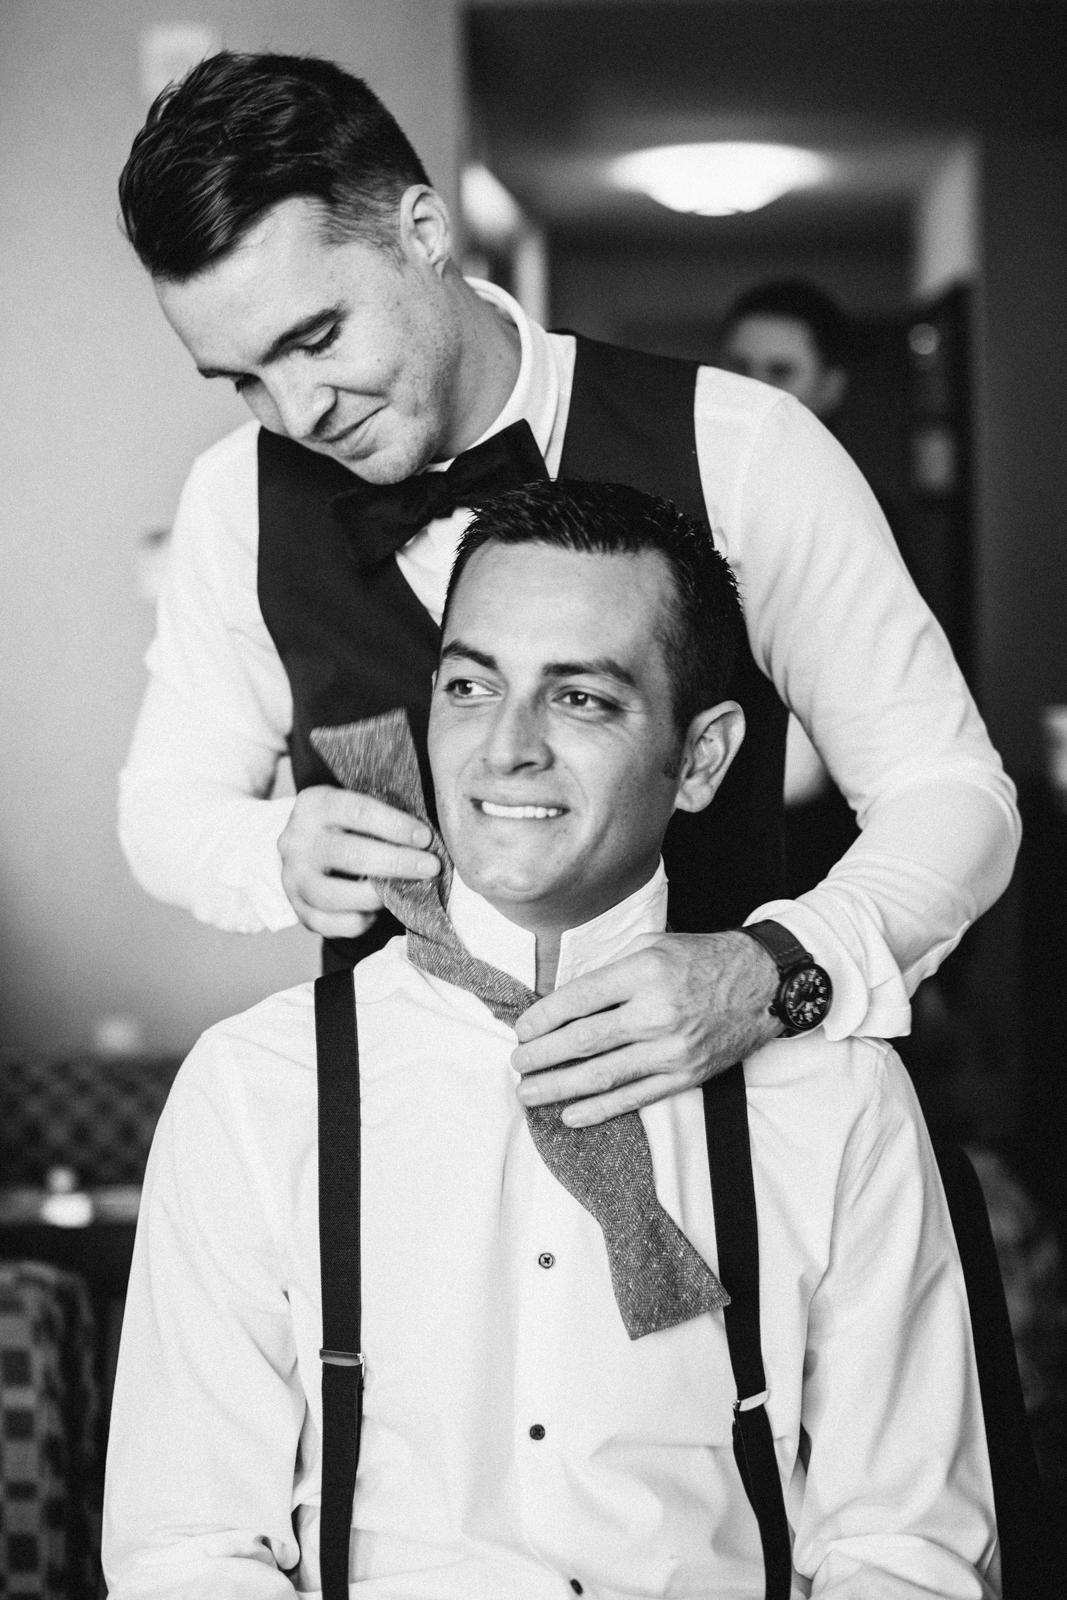 BeanandCole.com-Chris&JackieJohnson-Wedding-11.jpg